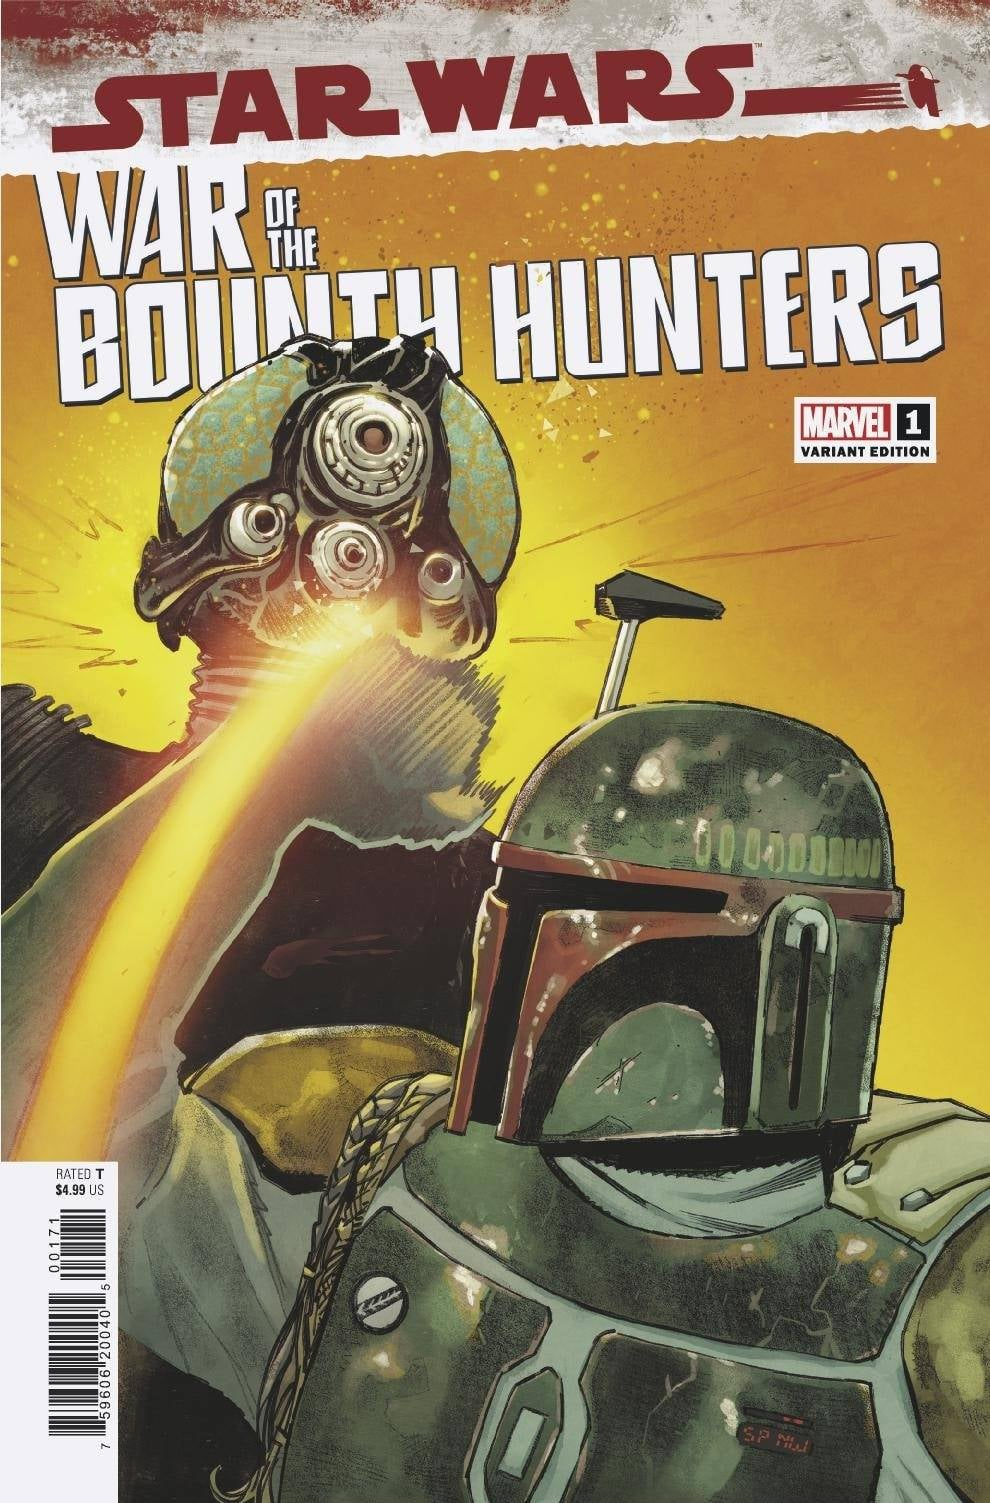 Star Wars: War of the Bounty Hunters 1 - Pichelli Variant